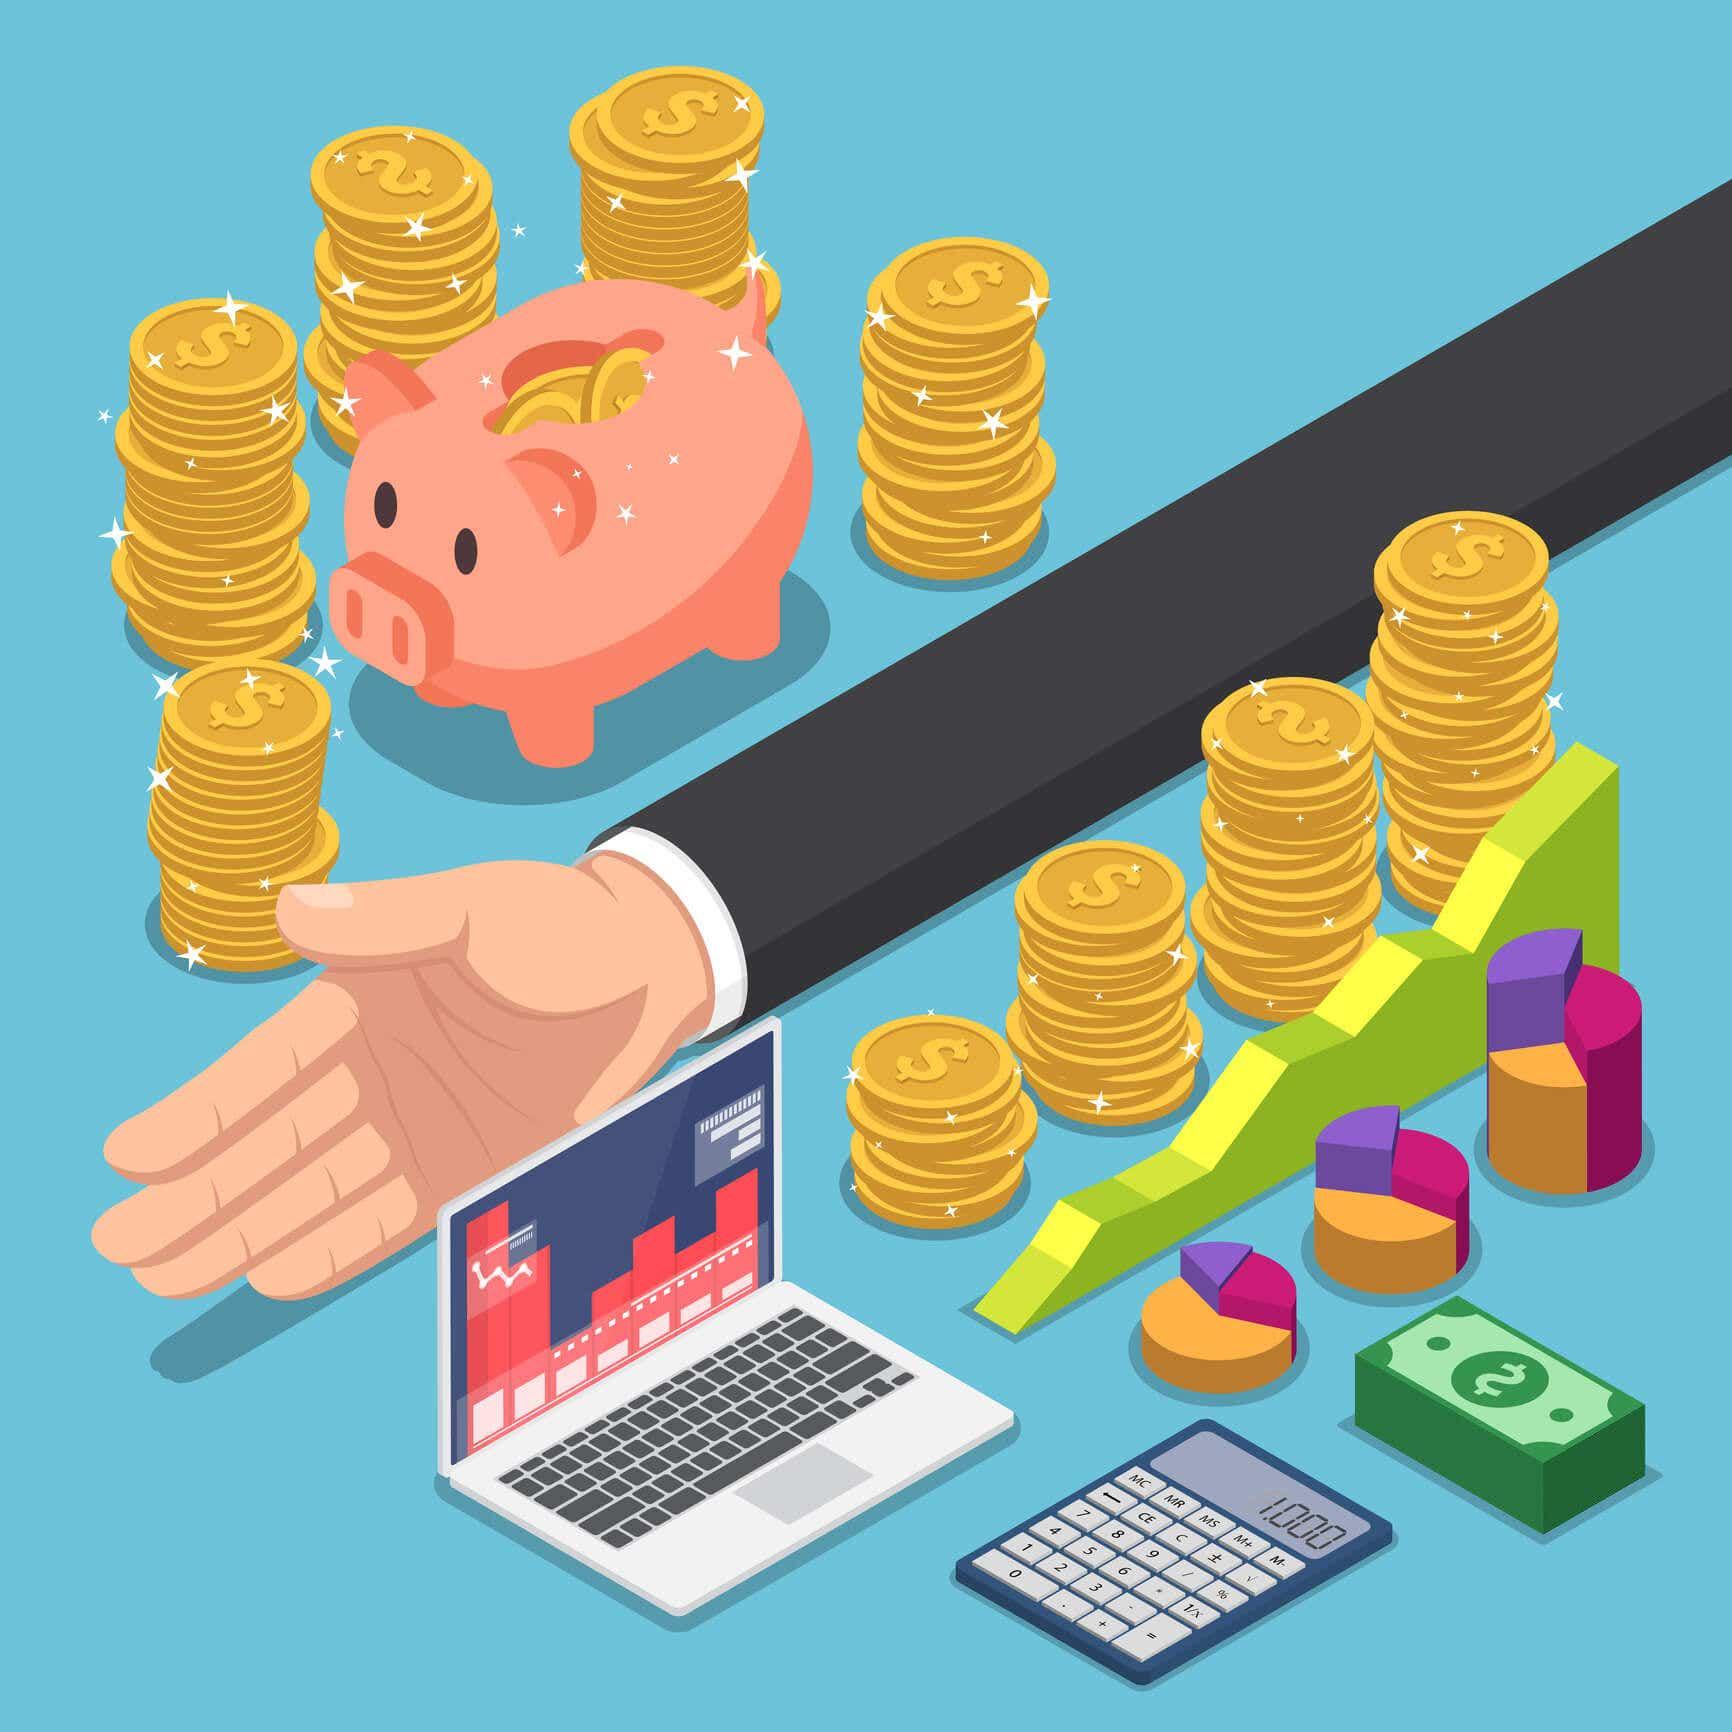 sole proprietor disadvantage unable to split equity